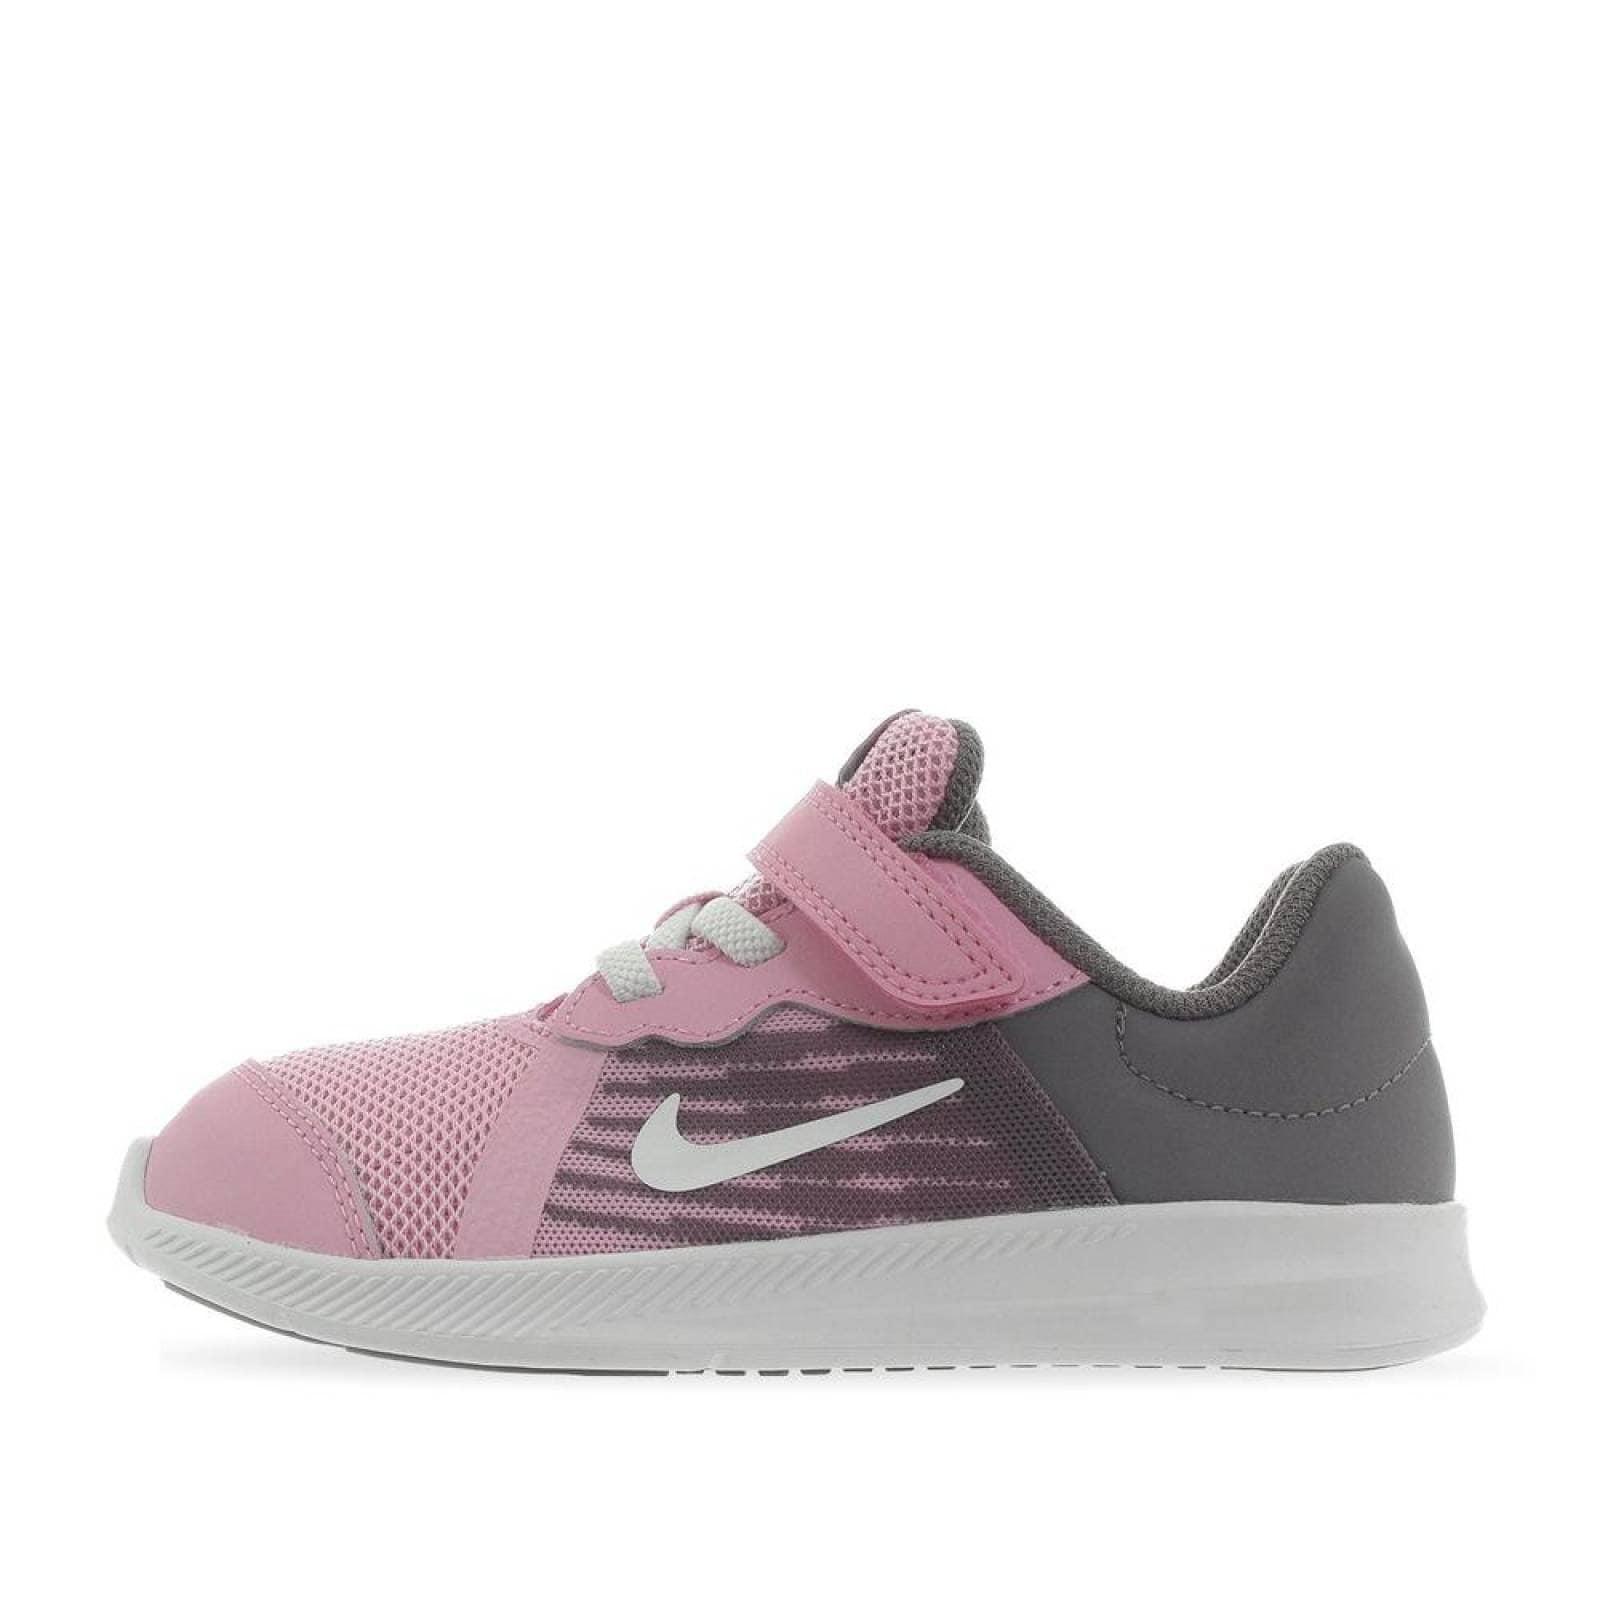 Tenis Nike Downshifter 8 922859602 Rosa Bebes